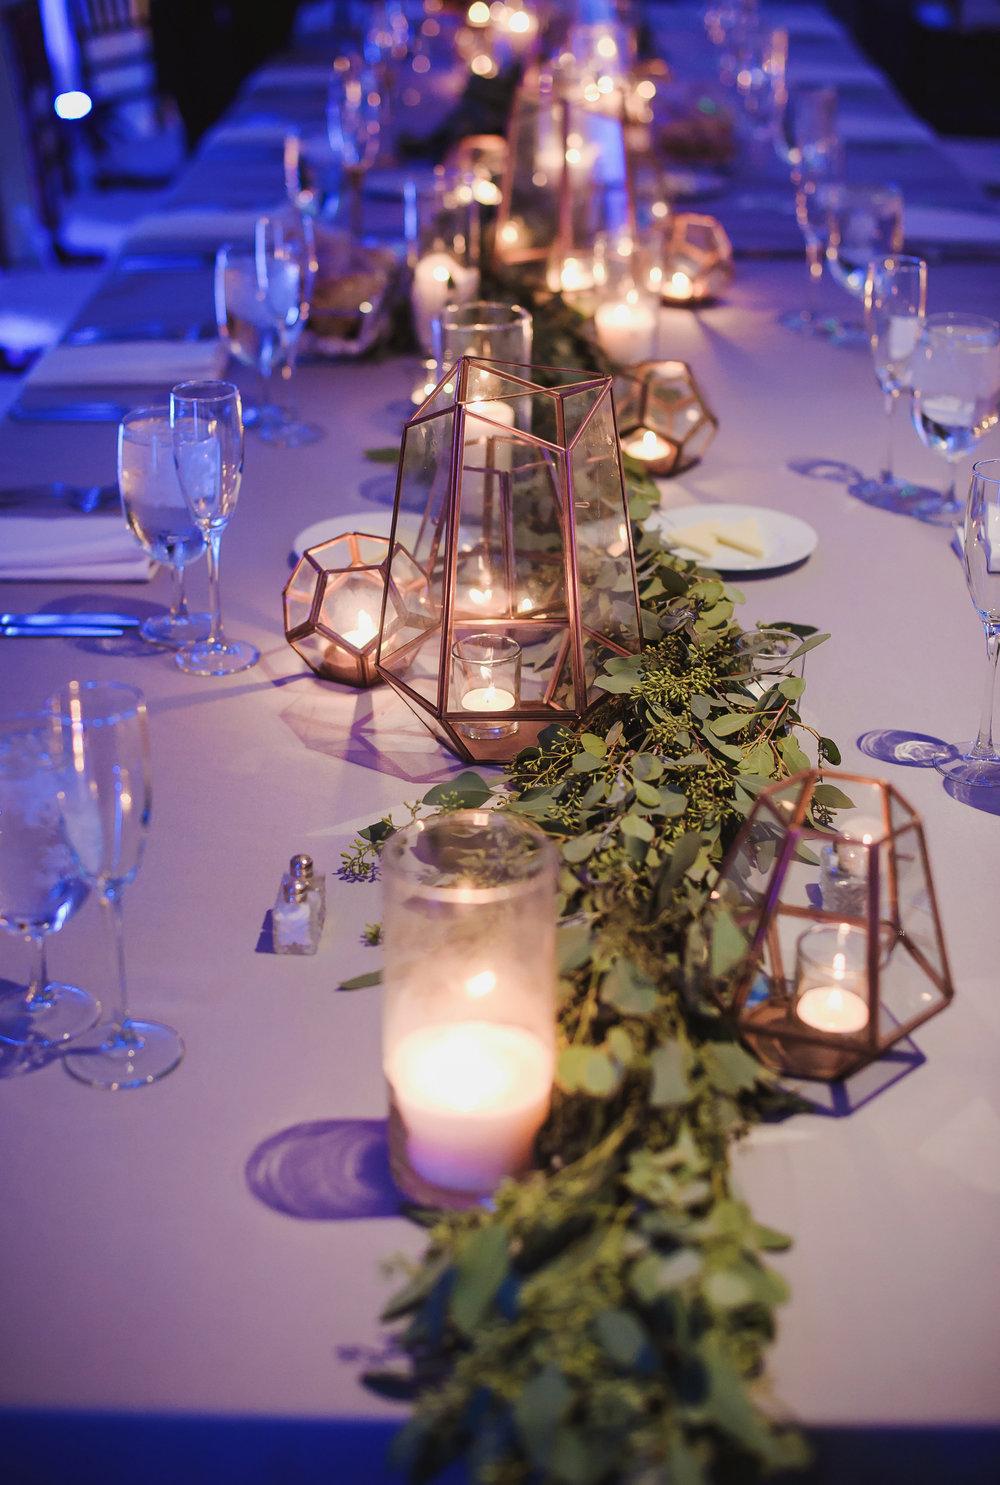 Baltimore Legg Mason Tower Wedding | East Made Event Company Baltimore Maryland Wedding Planner | Photo by Hannah Gunnell7457.jpg